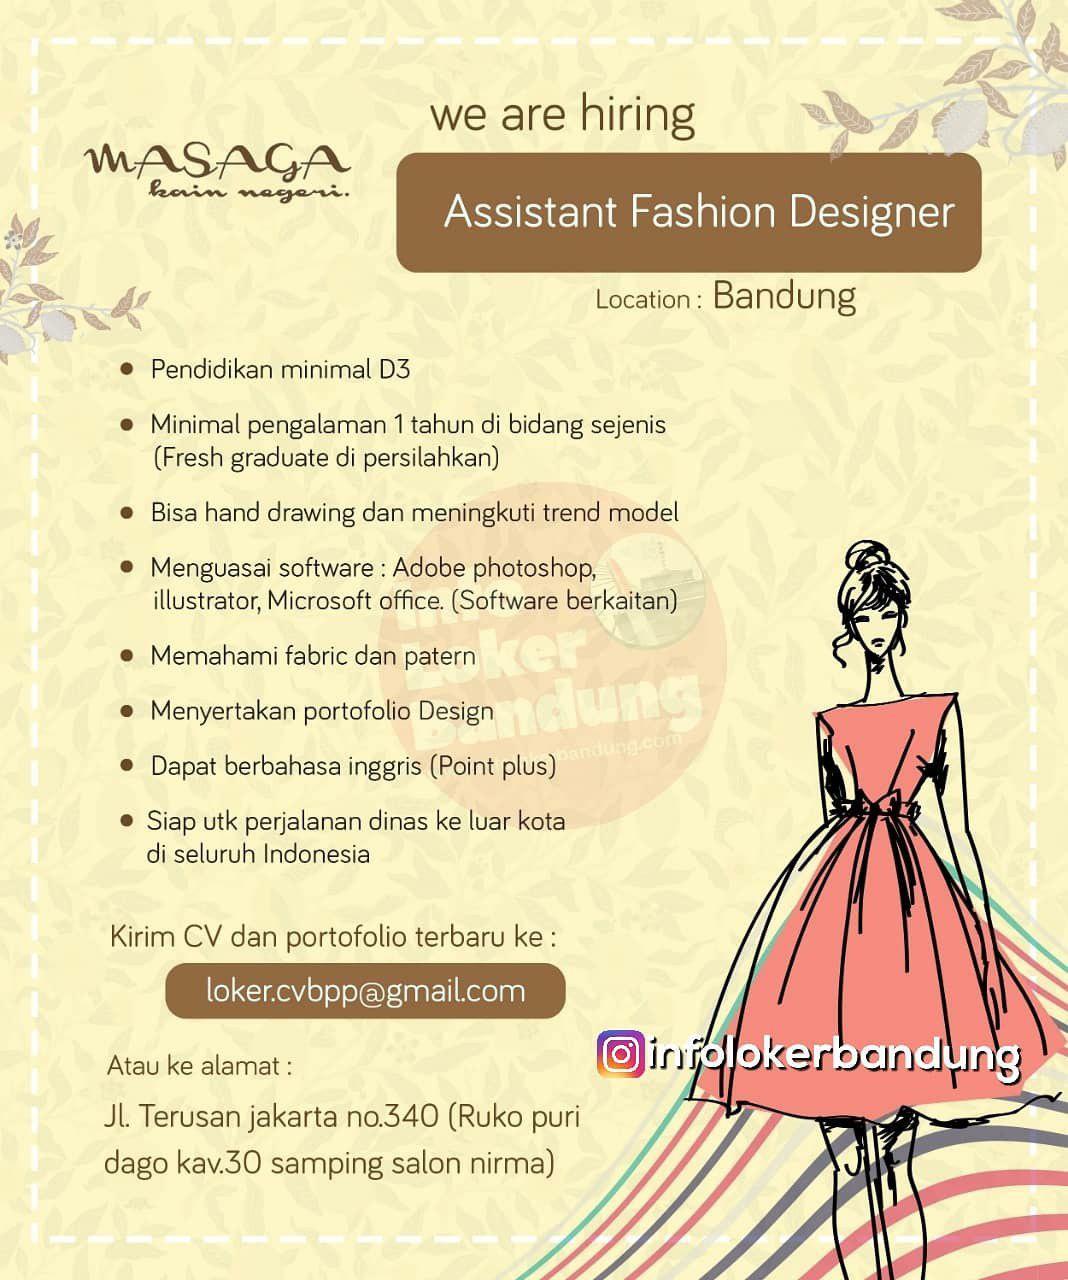 Lowongan Kerja Asistant Fashion Designer Masaga Kain Negeri Bandung Januari 2019